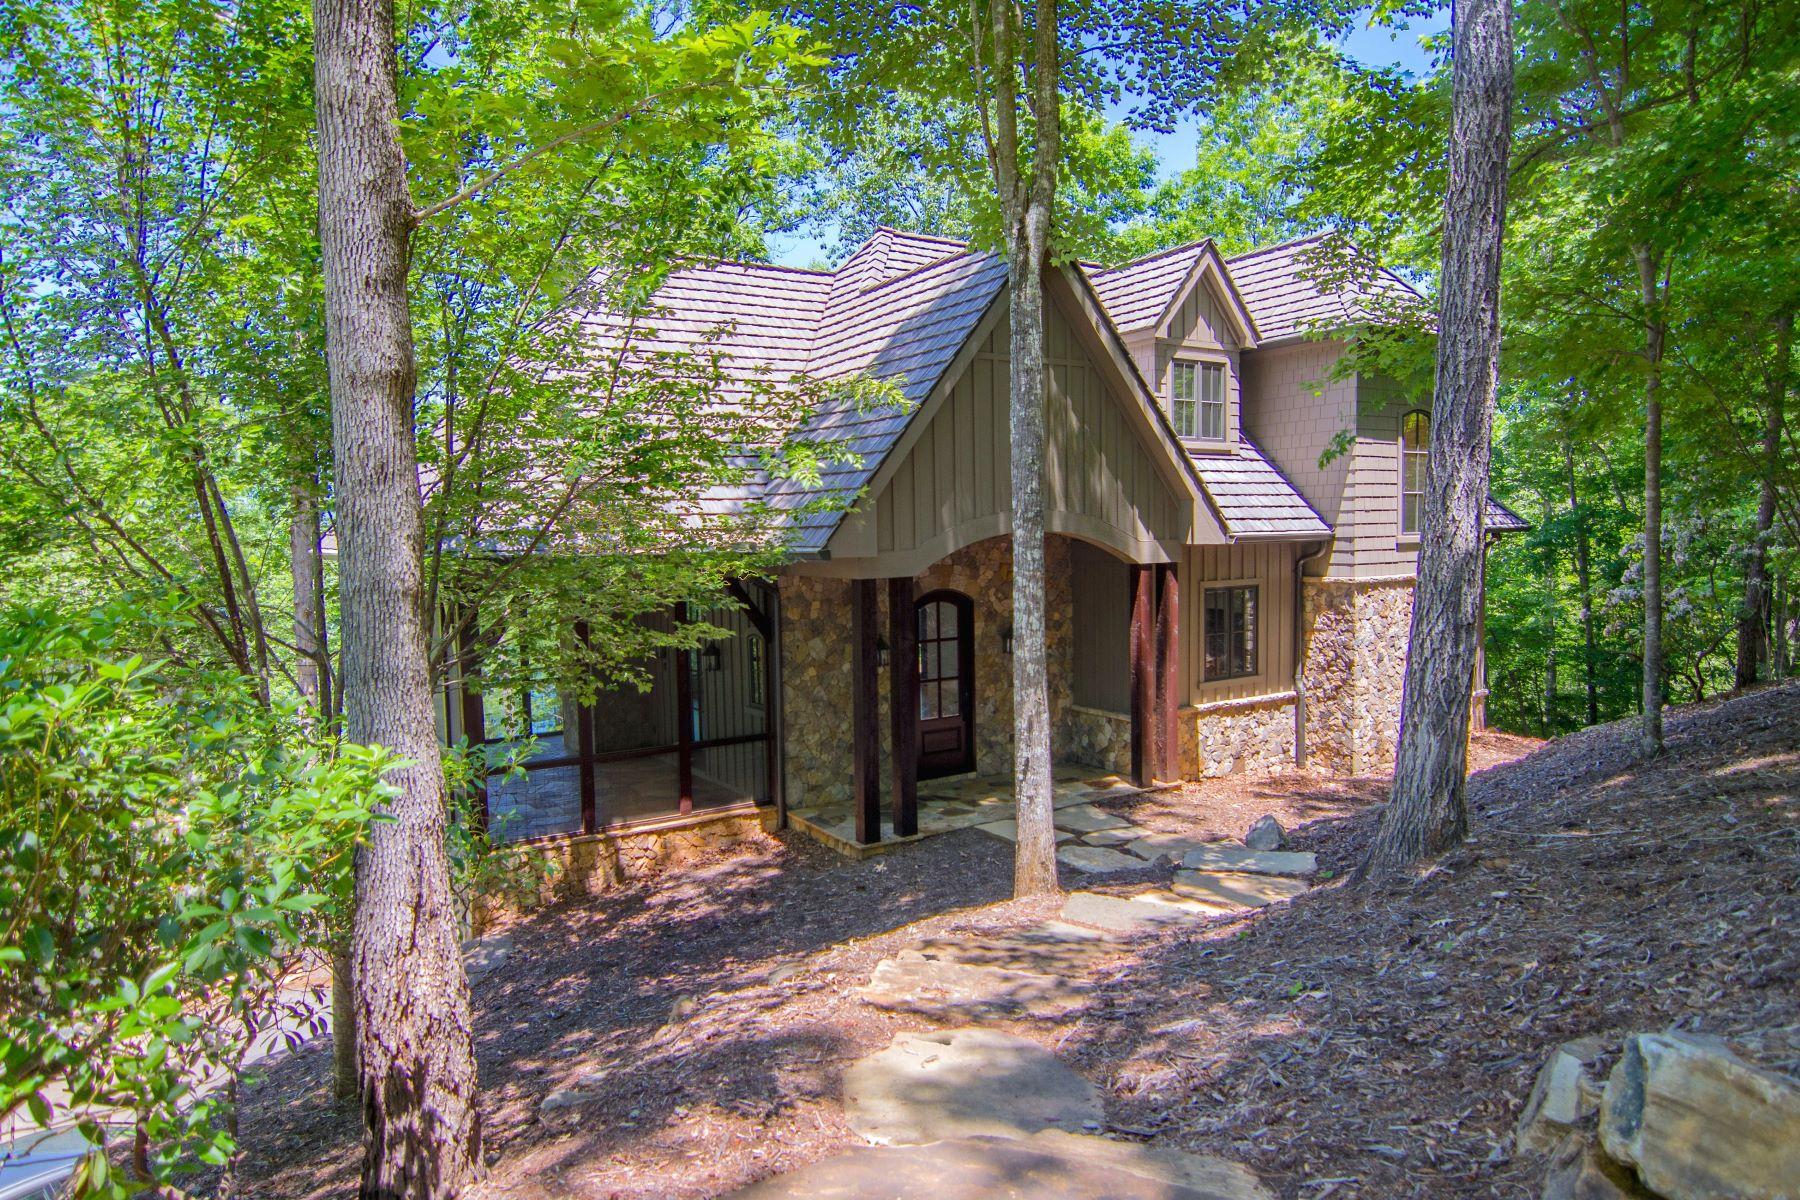 Einfamilienhaus für Verkauf beim Craftsman Style Waterfront Home with Impressive Lake & Mountain Views 207 Coldwater Drive The Reserve At Lake Keowee, Sunset, South Carolina, 29685 Vereinigte Staaten